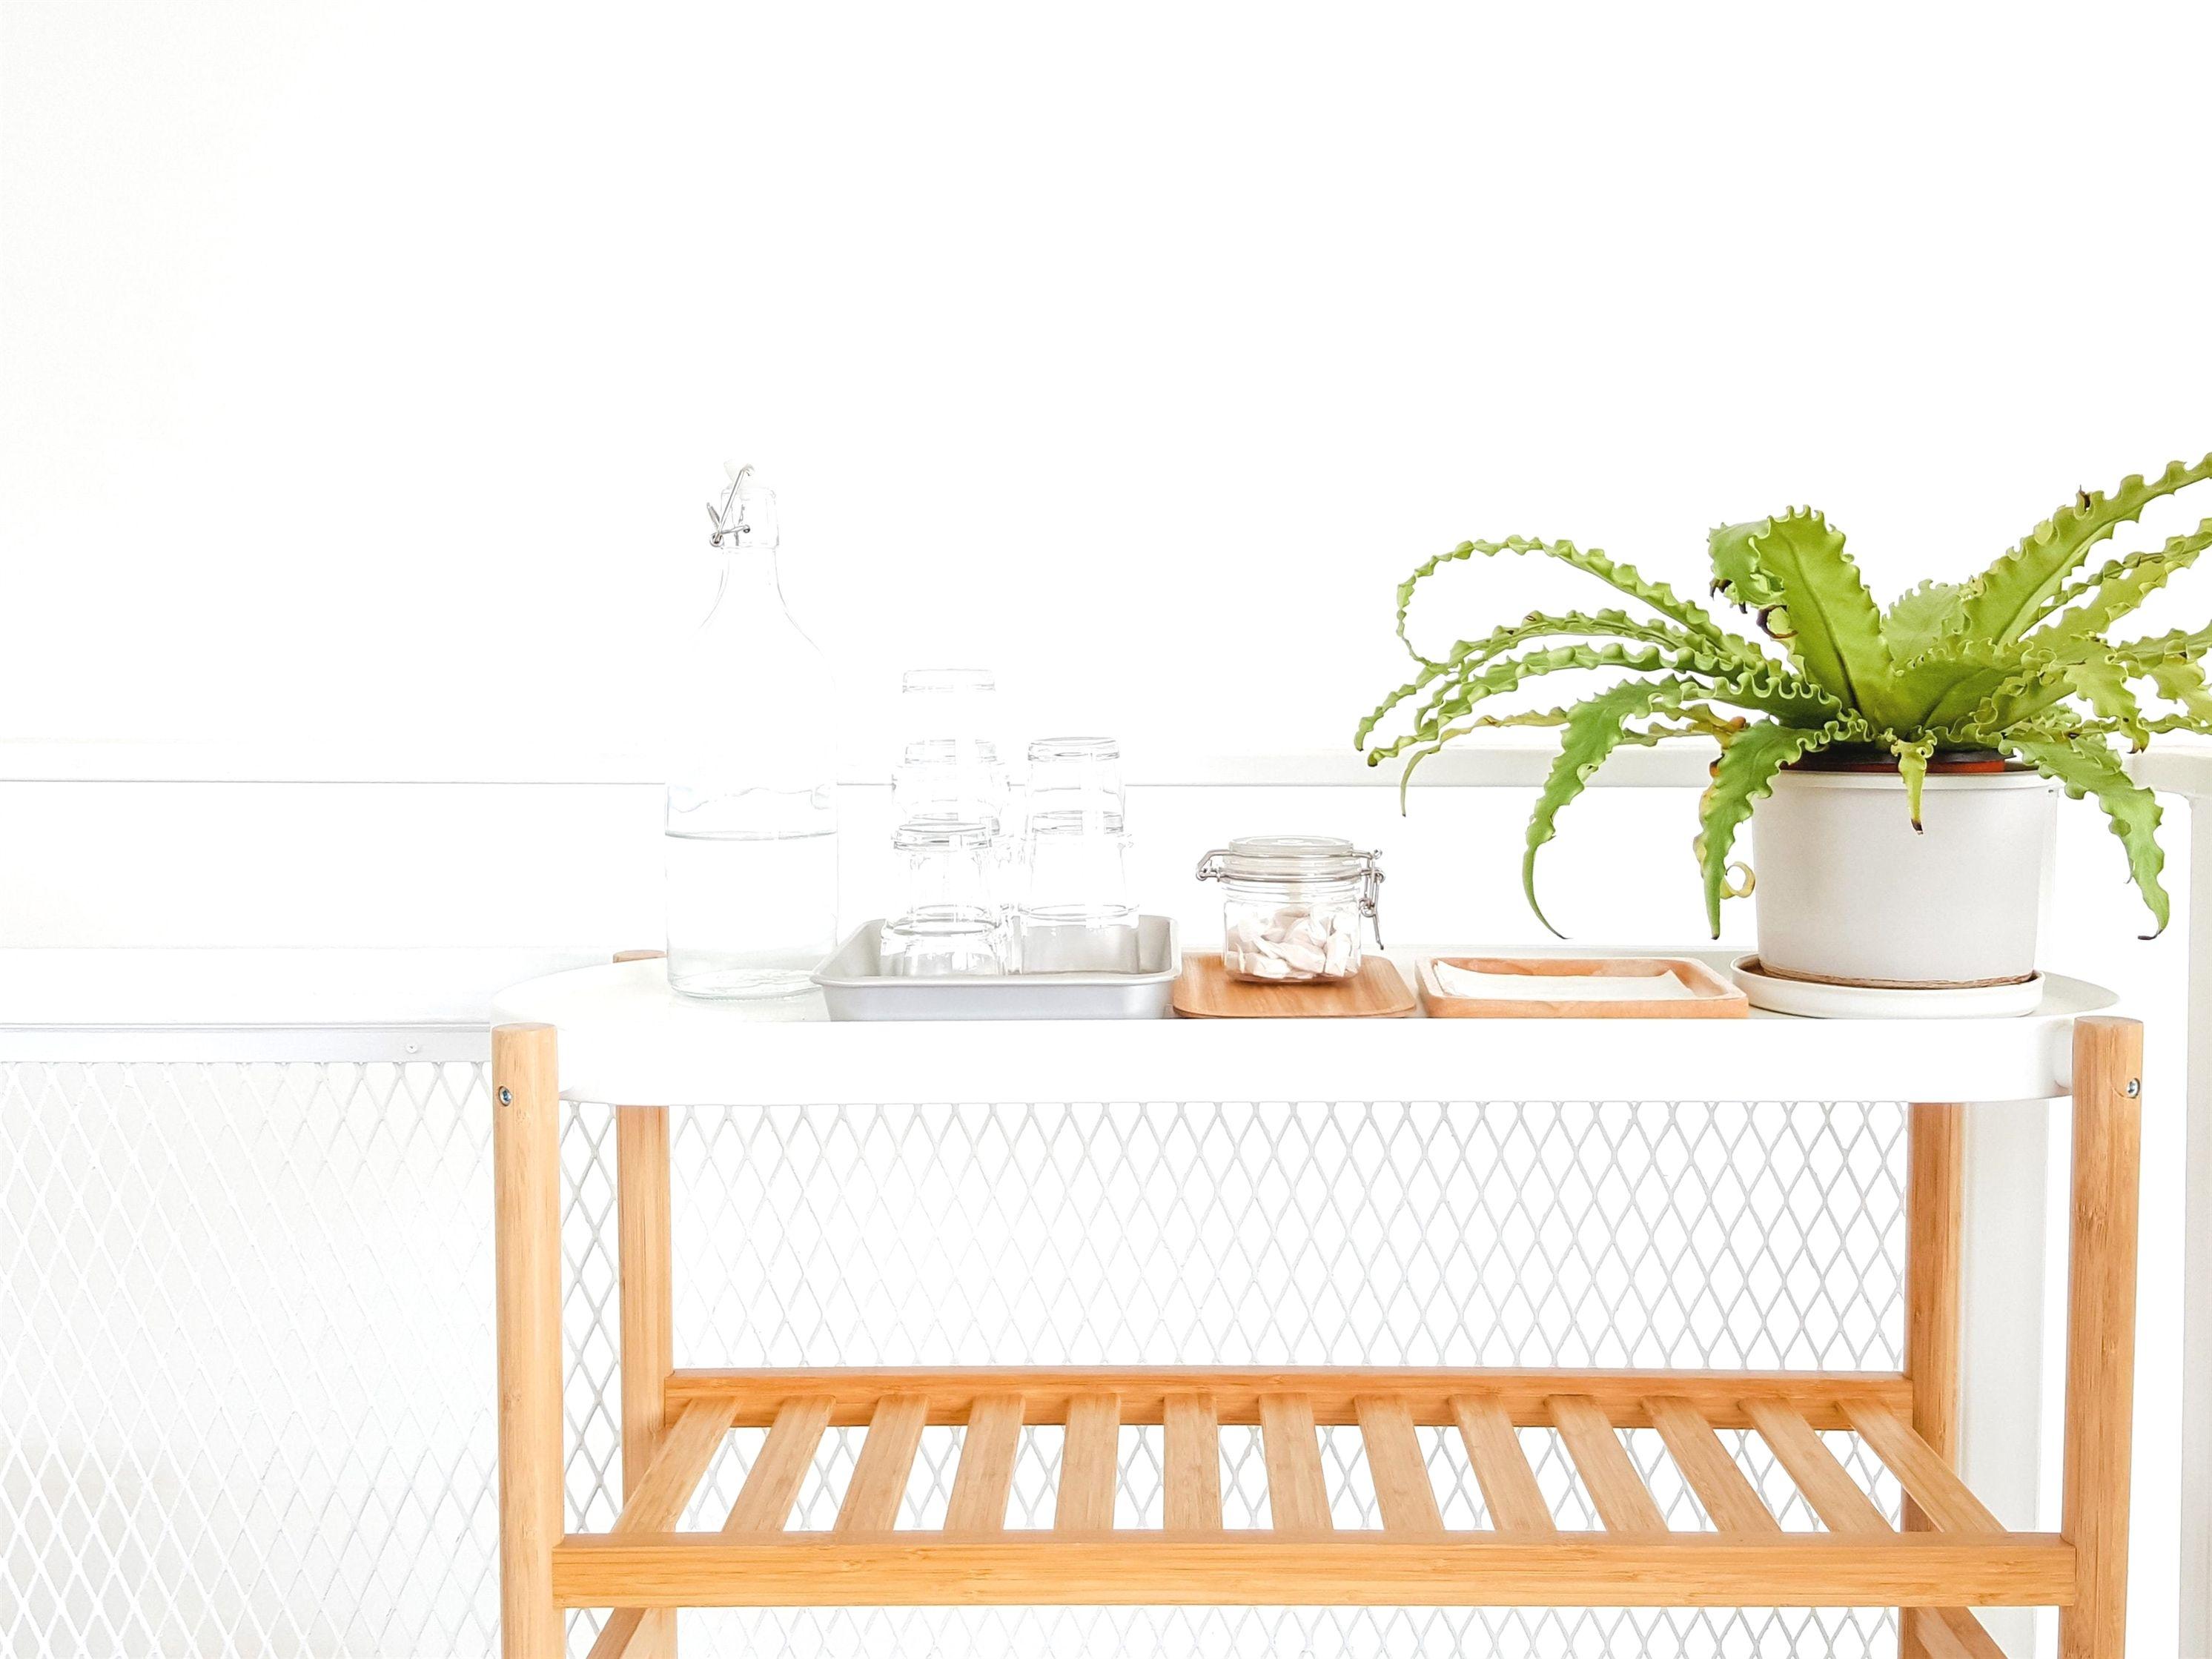 Abbey Home Decor Quilt 708 20190108094908 62 Home Decor